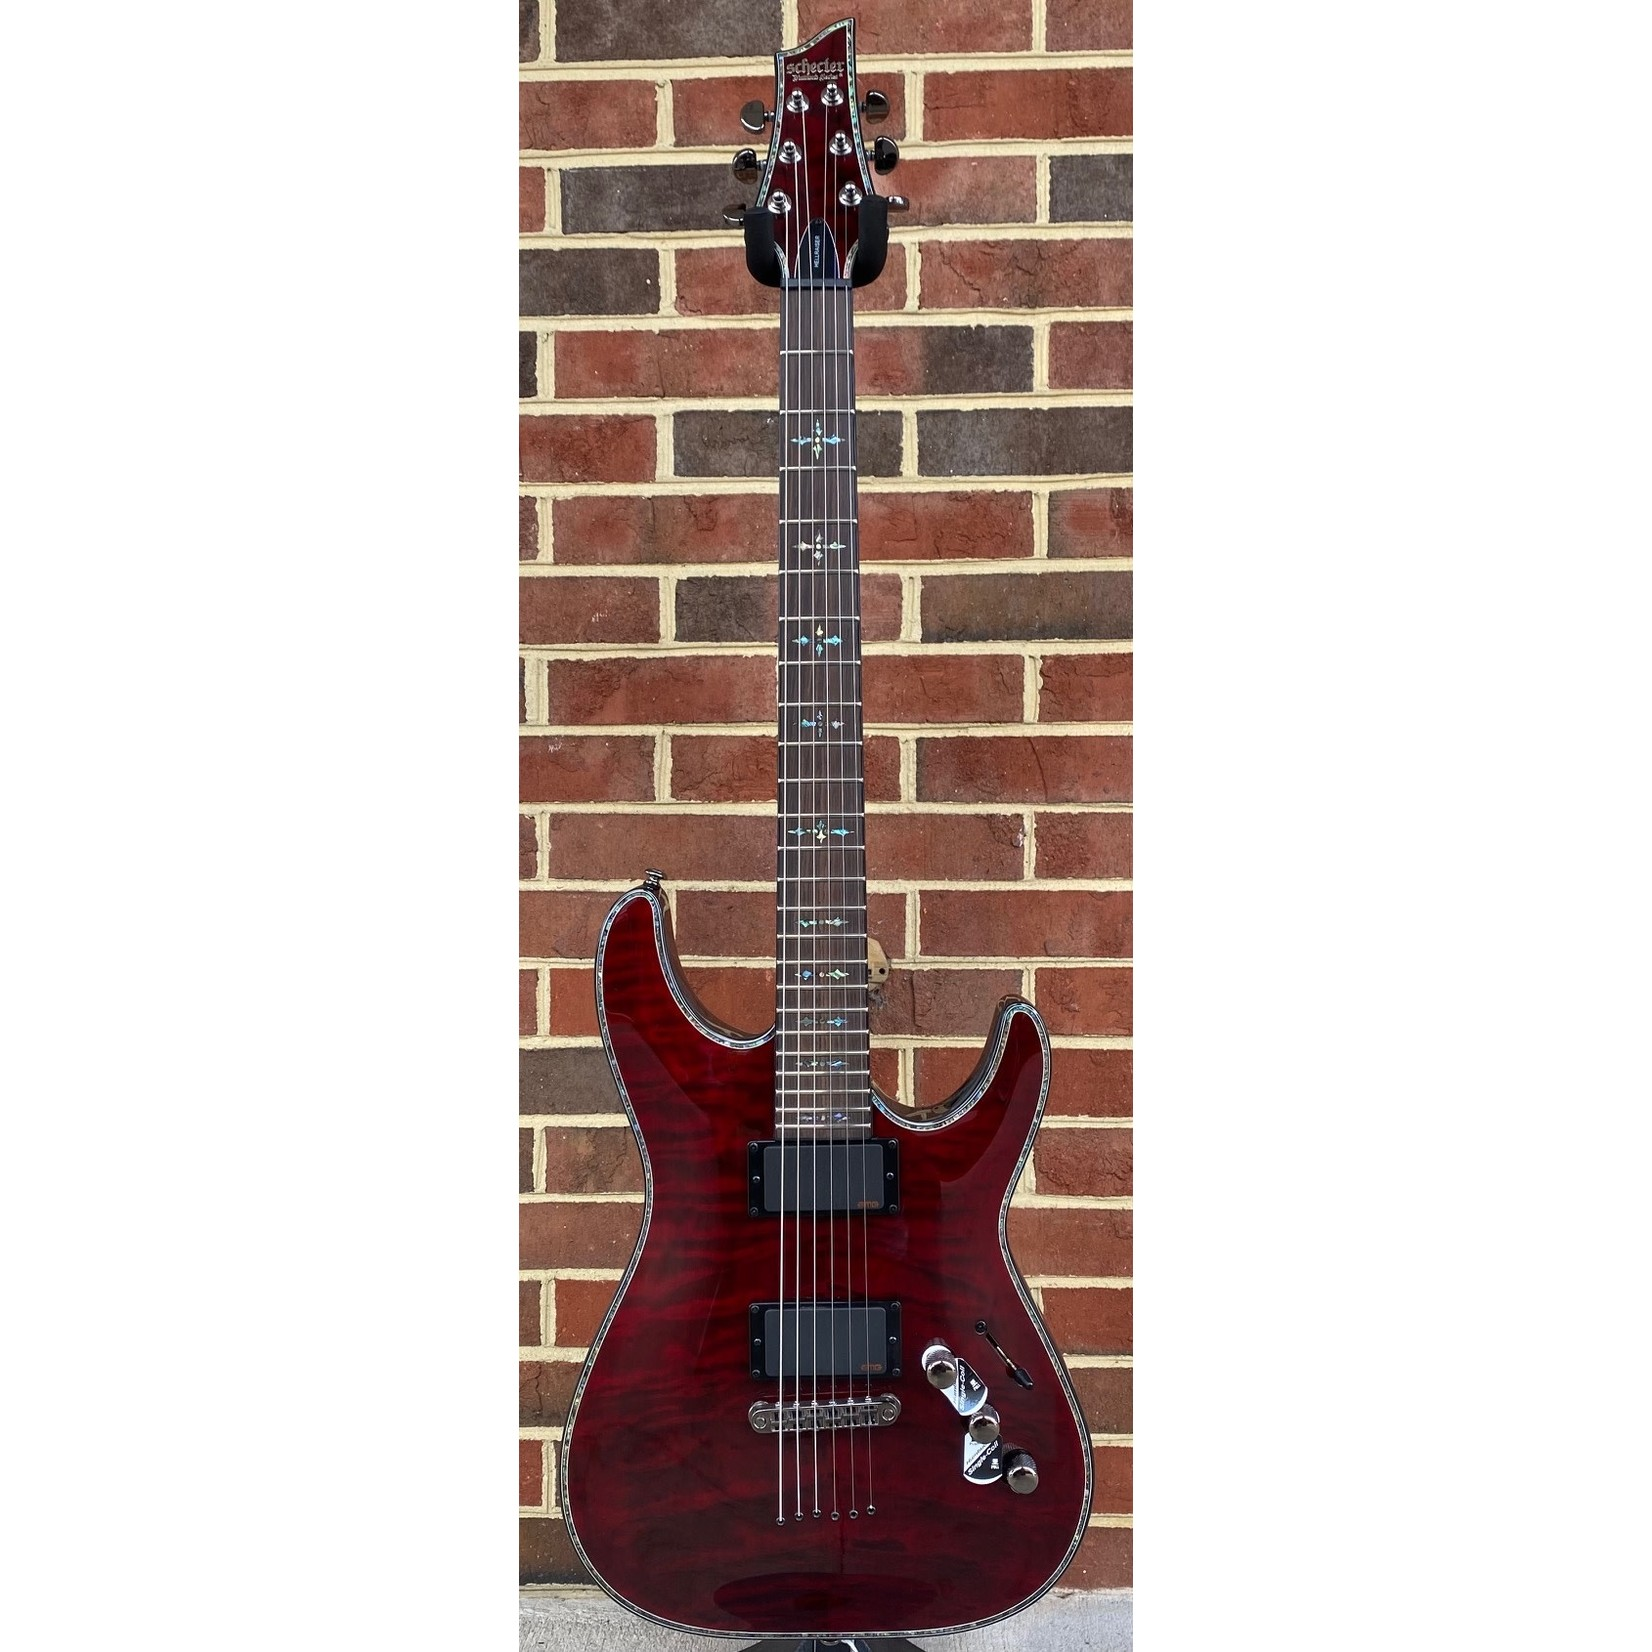 Schecter Guitar Research Schecter Hellraiser C-1, Black Cherry, Quilted Maple Top, EMG 81TW/89R pickups, Schecter Locking Tuners